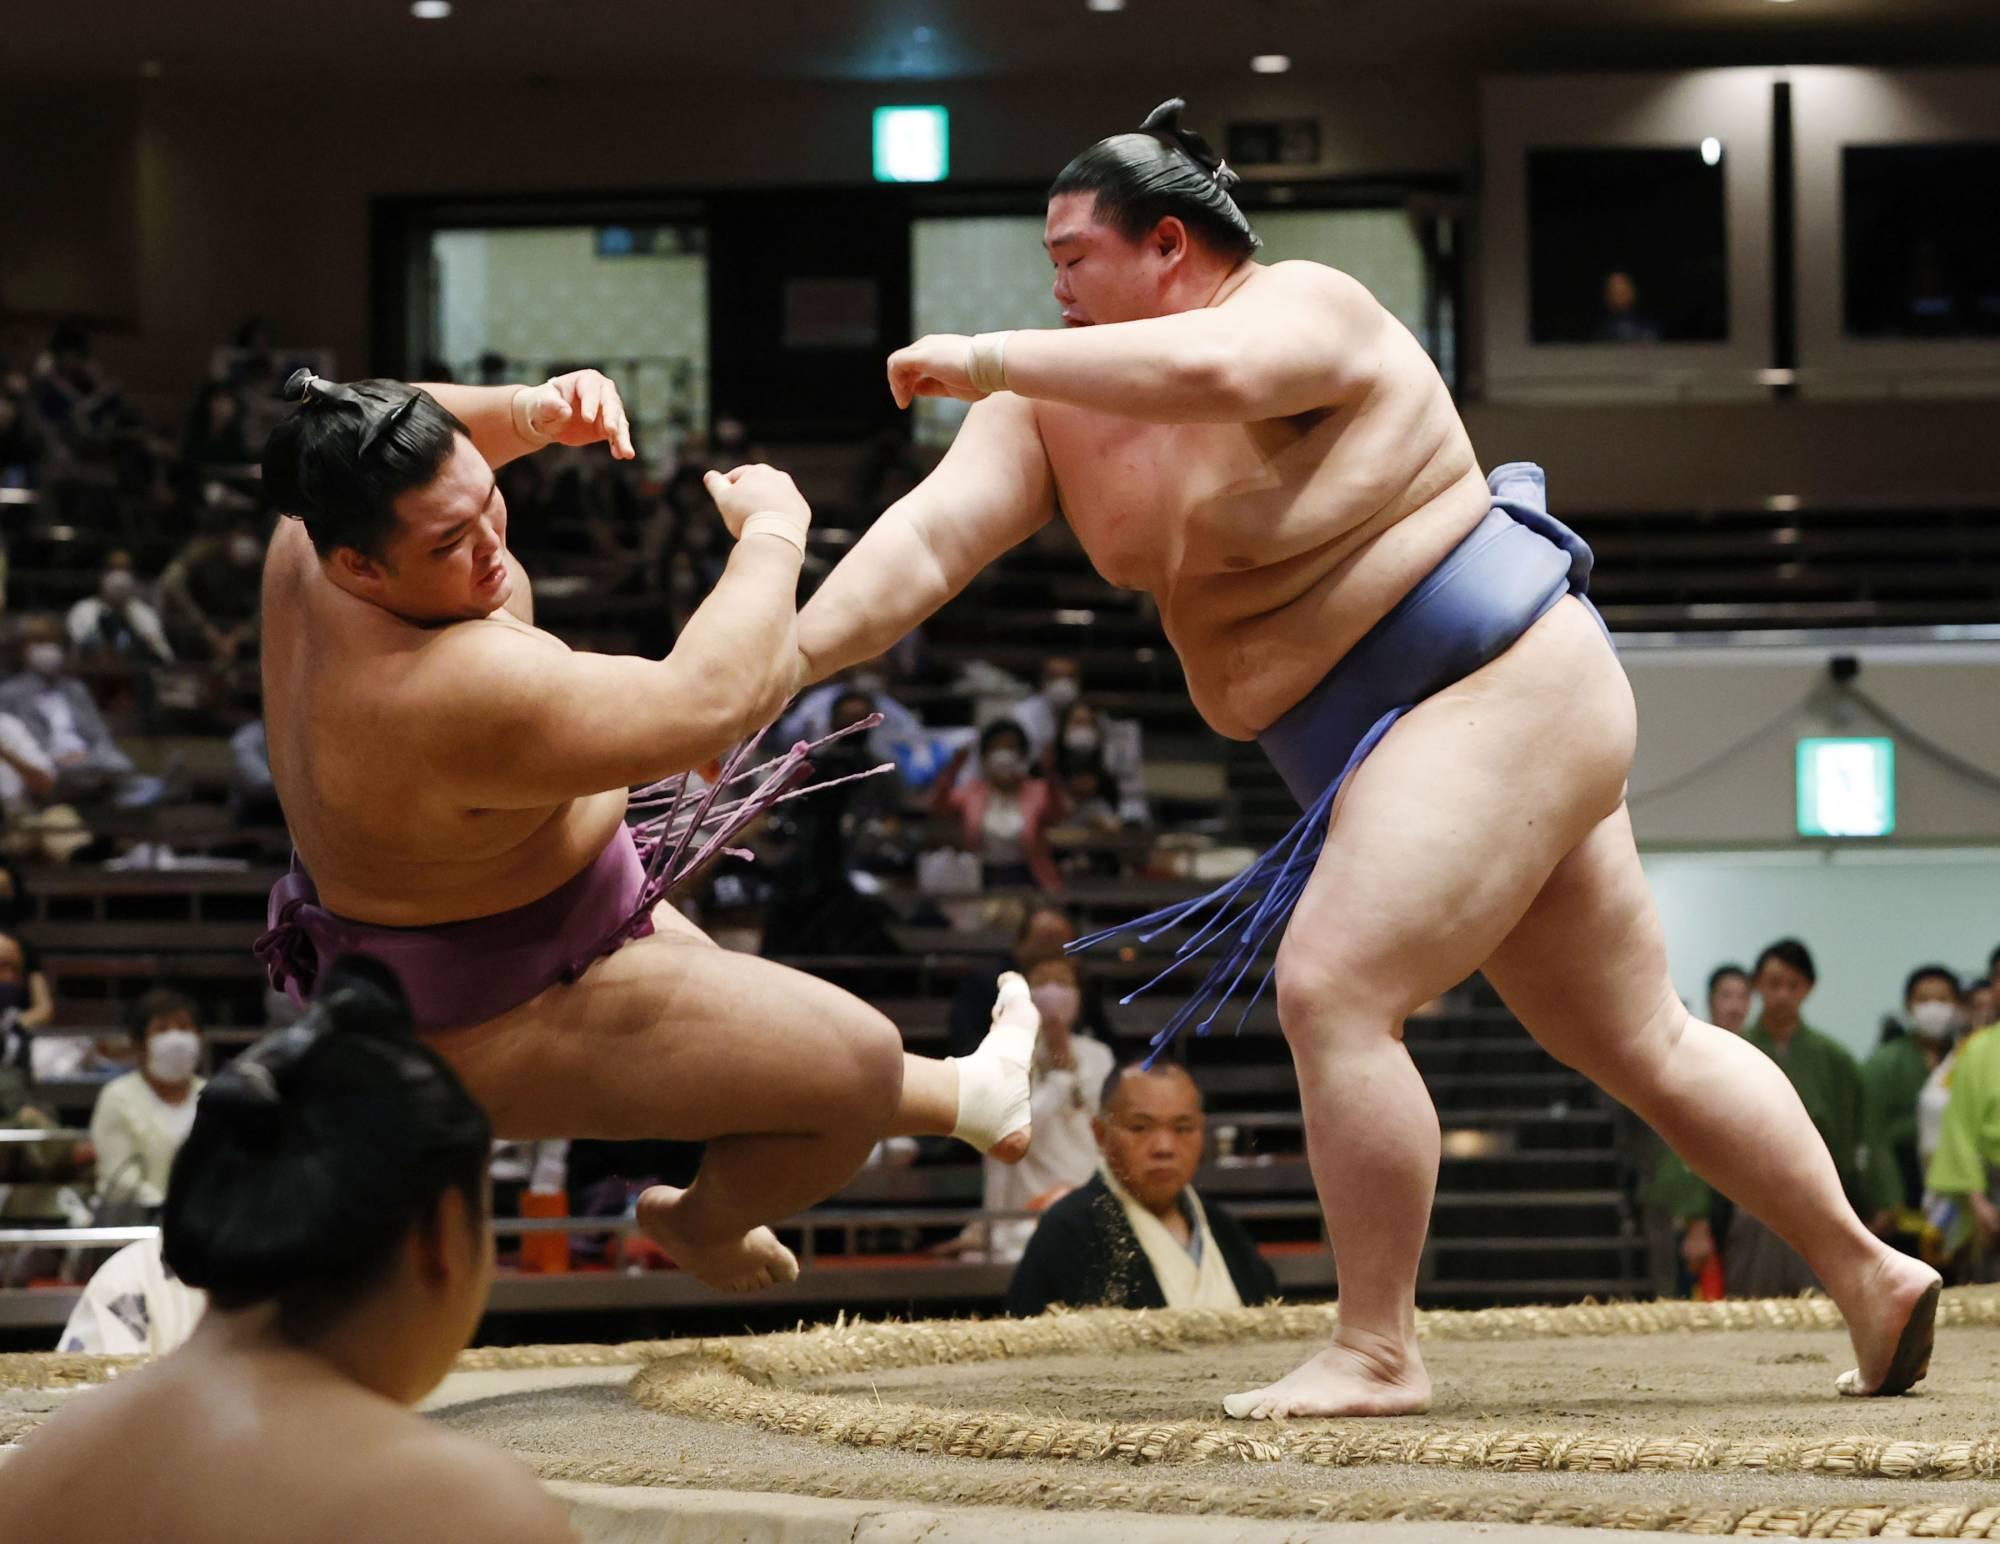 турниры в сумо